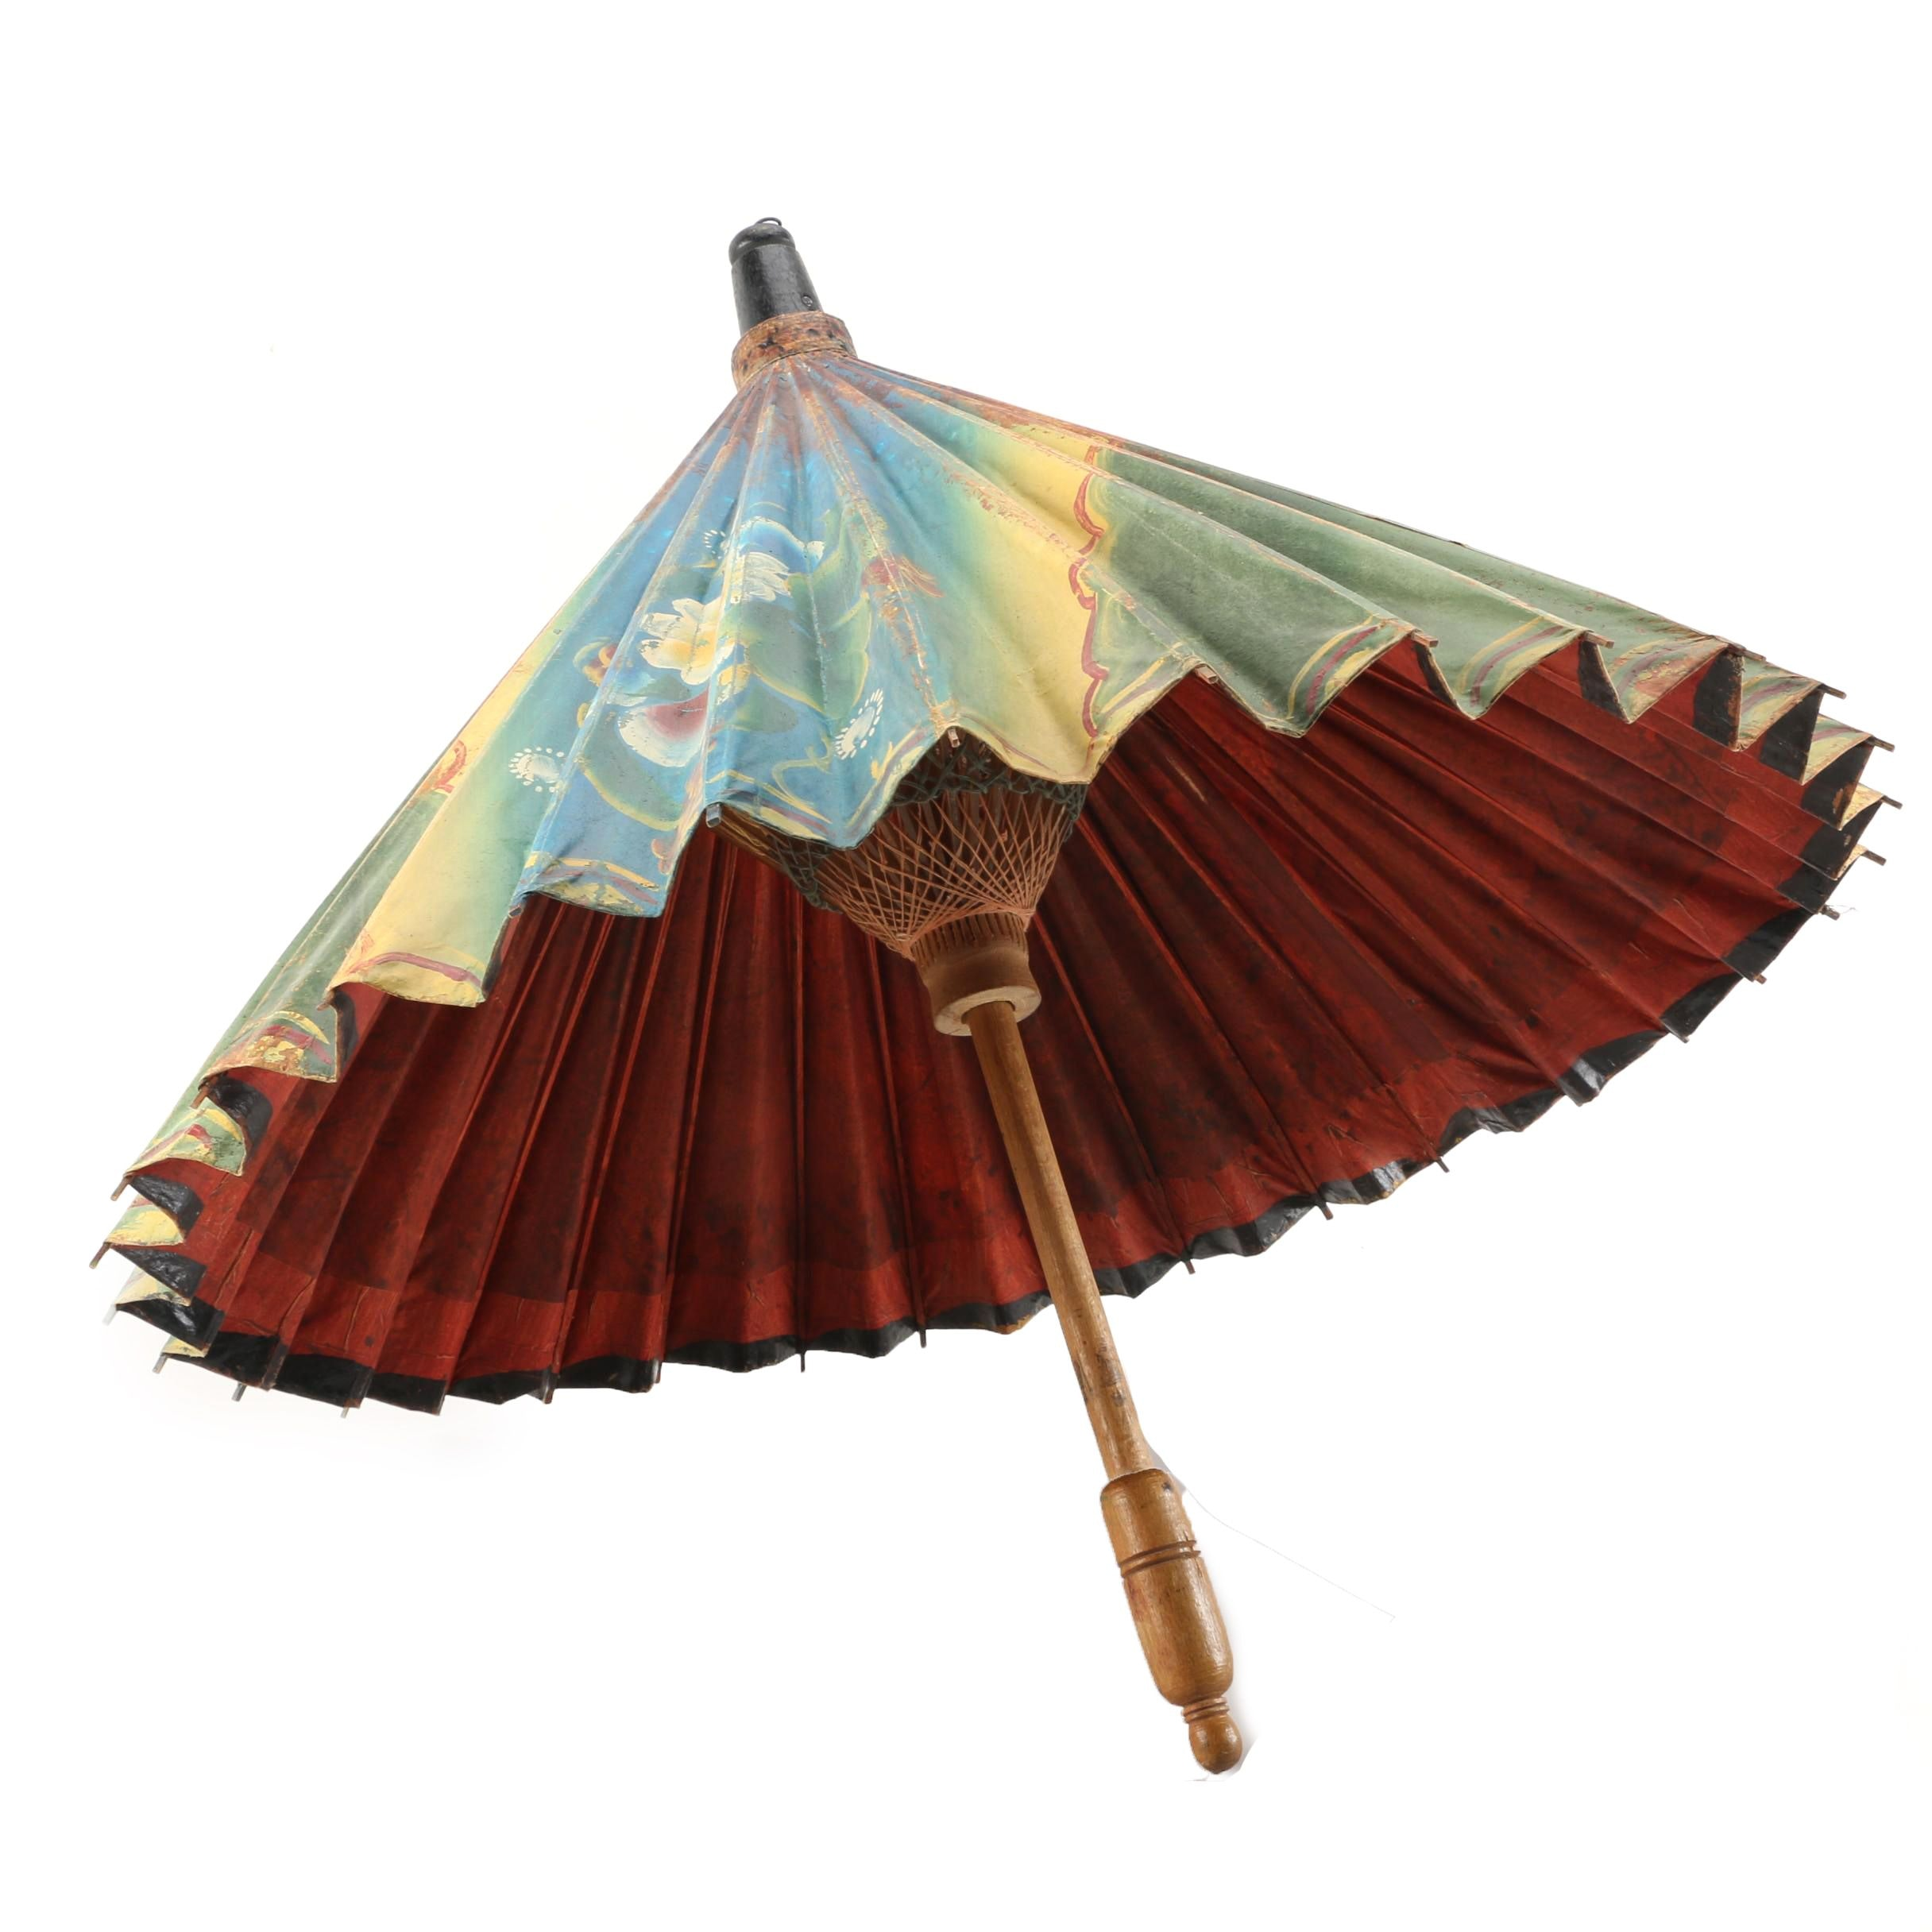 Vintage Hawaiian Style Hand-Painted Umbrella